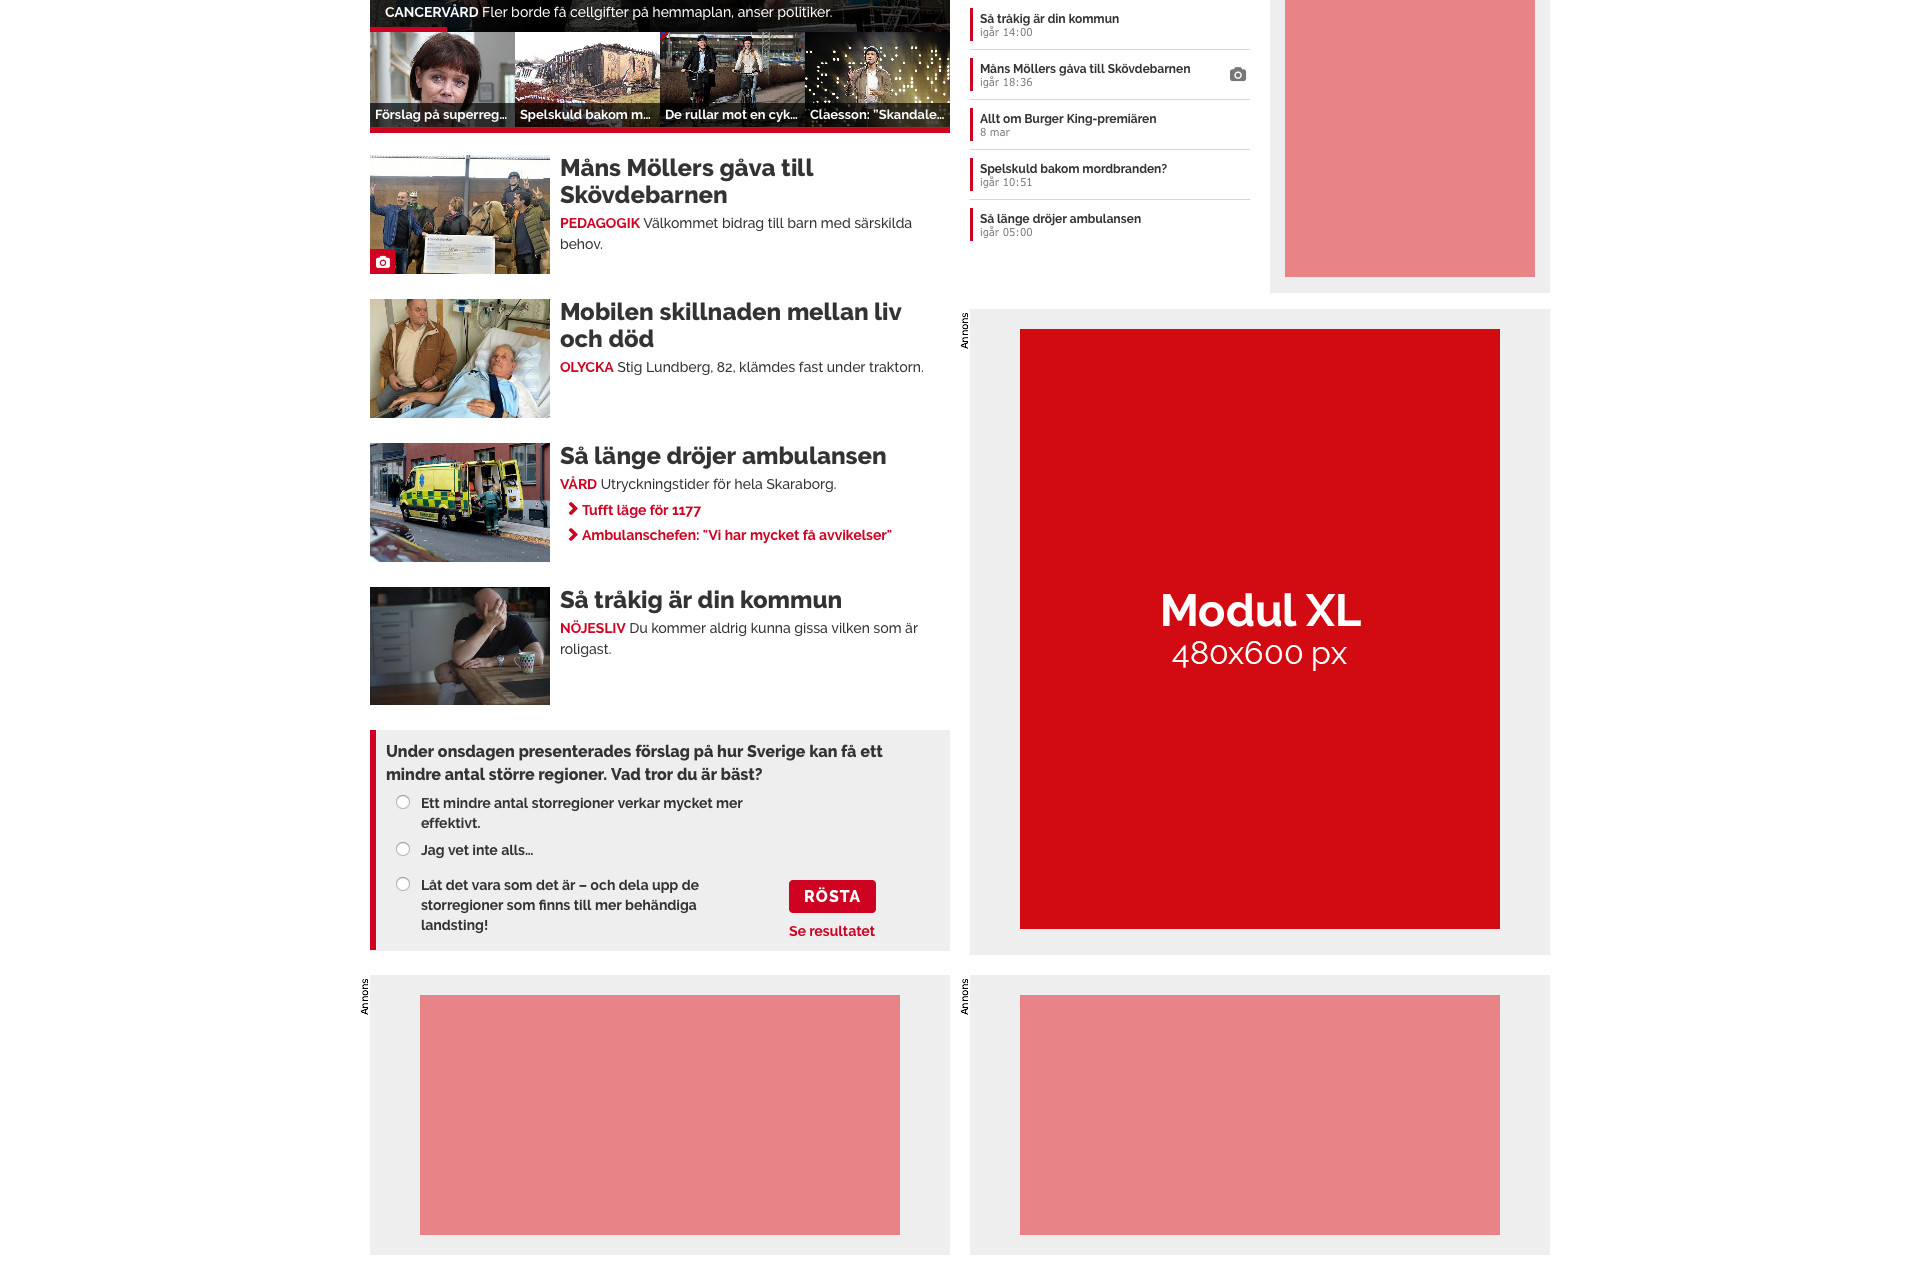 Module XL